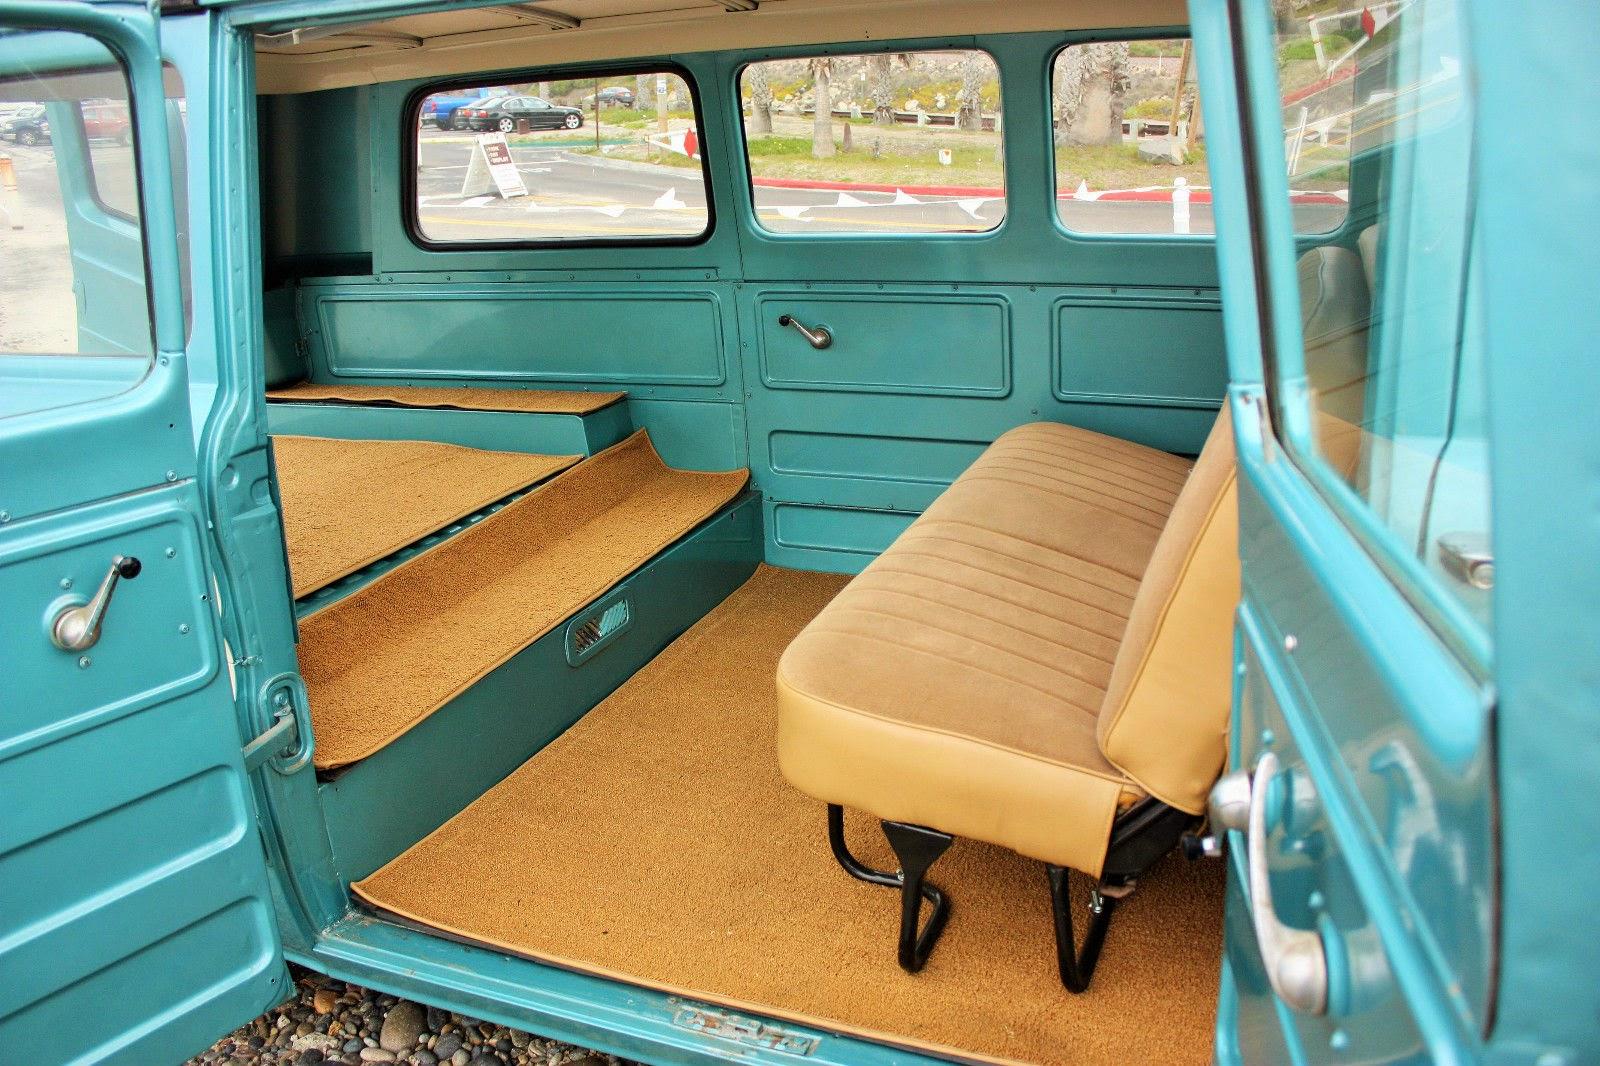 63 chevrolet corvair greenbrier. Black Bedroom Furniture Sets. Home Design Ideas